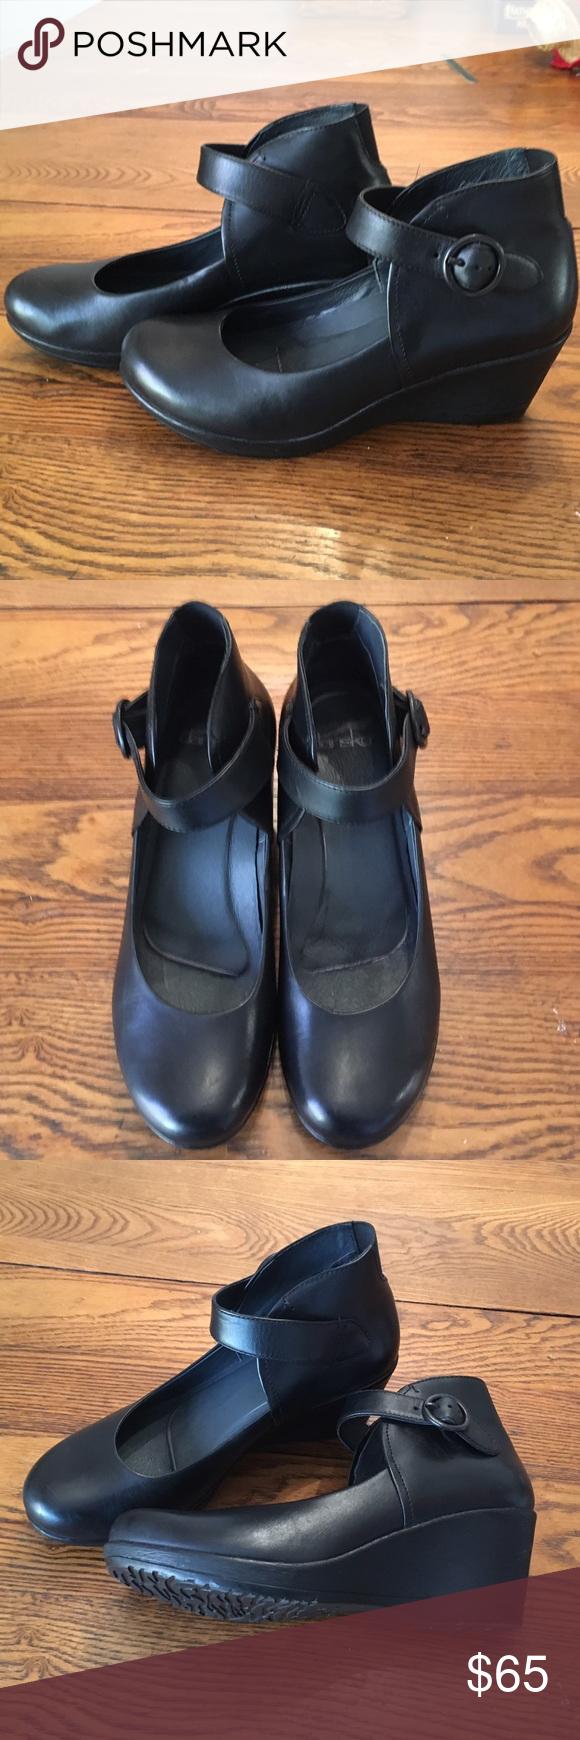 "Dansko ""Rebel"" shoe Dansko ""Rebel"" shoe.  Great condition. Just too big for me. Dansko Shoes"